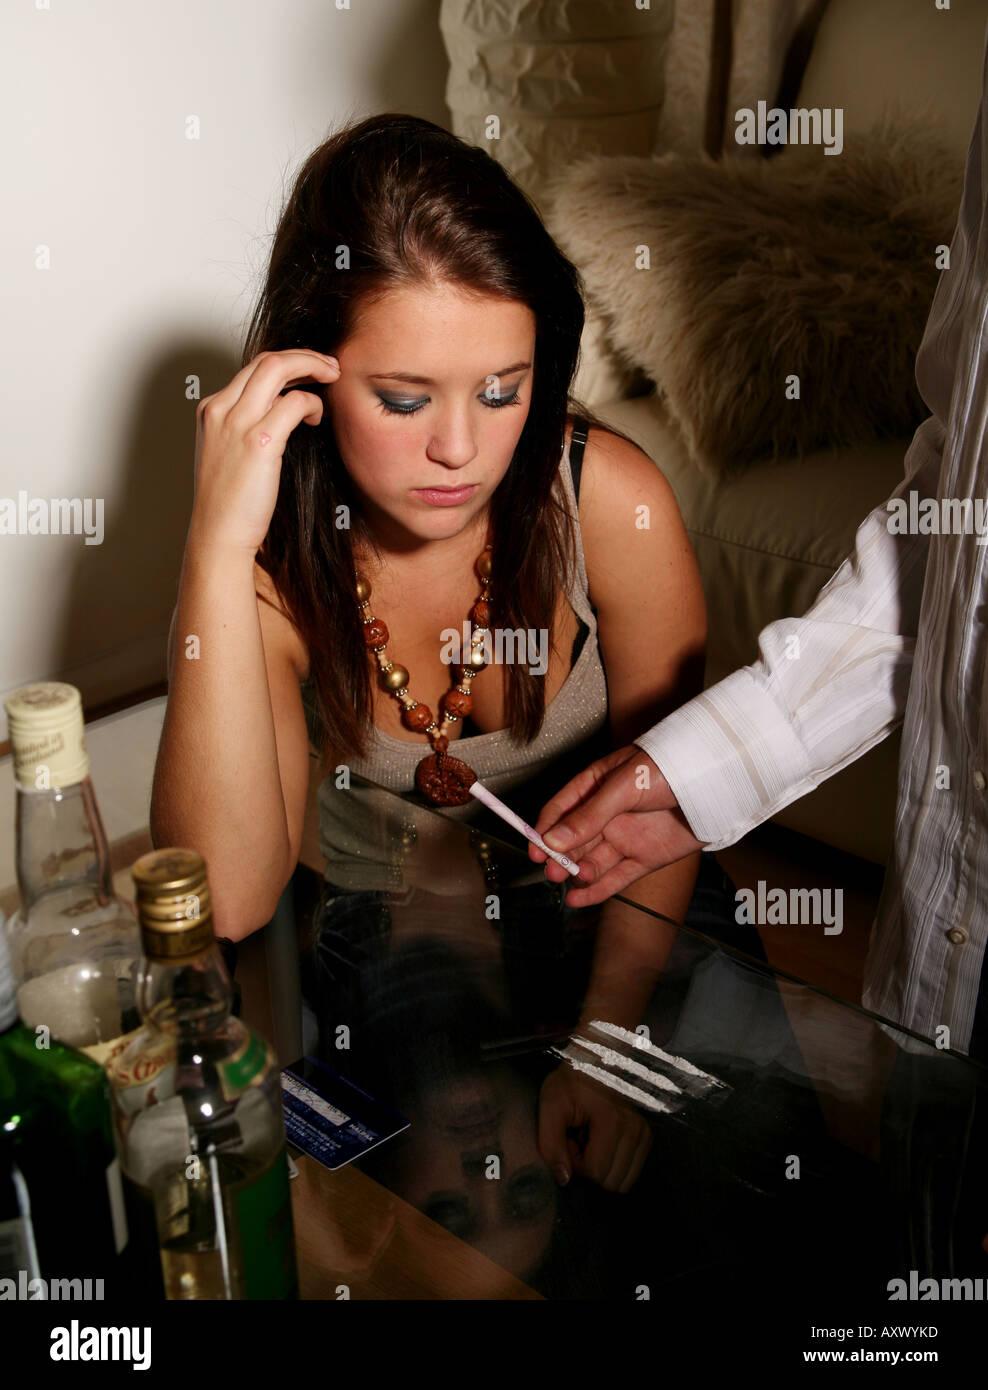 Girl snorting coke drug remarkable, very